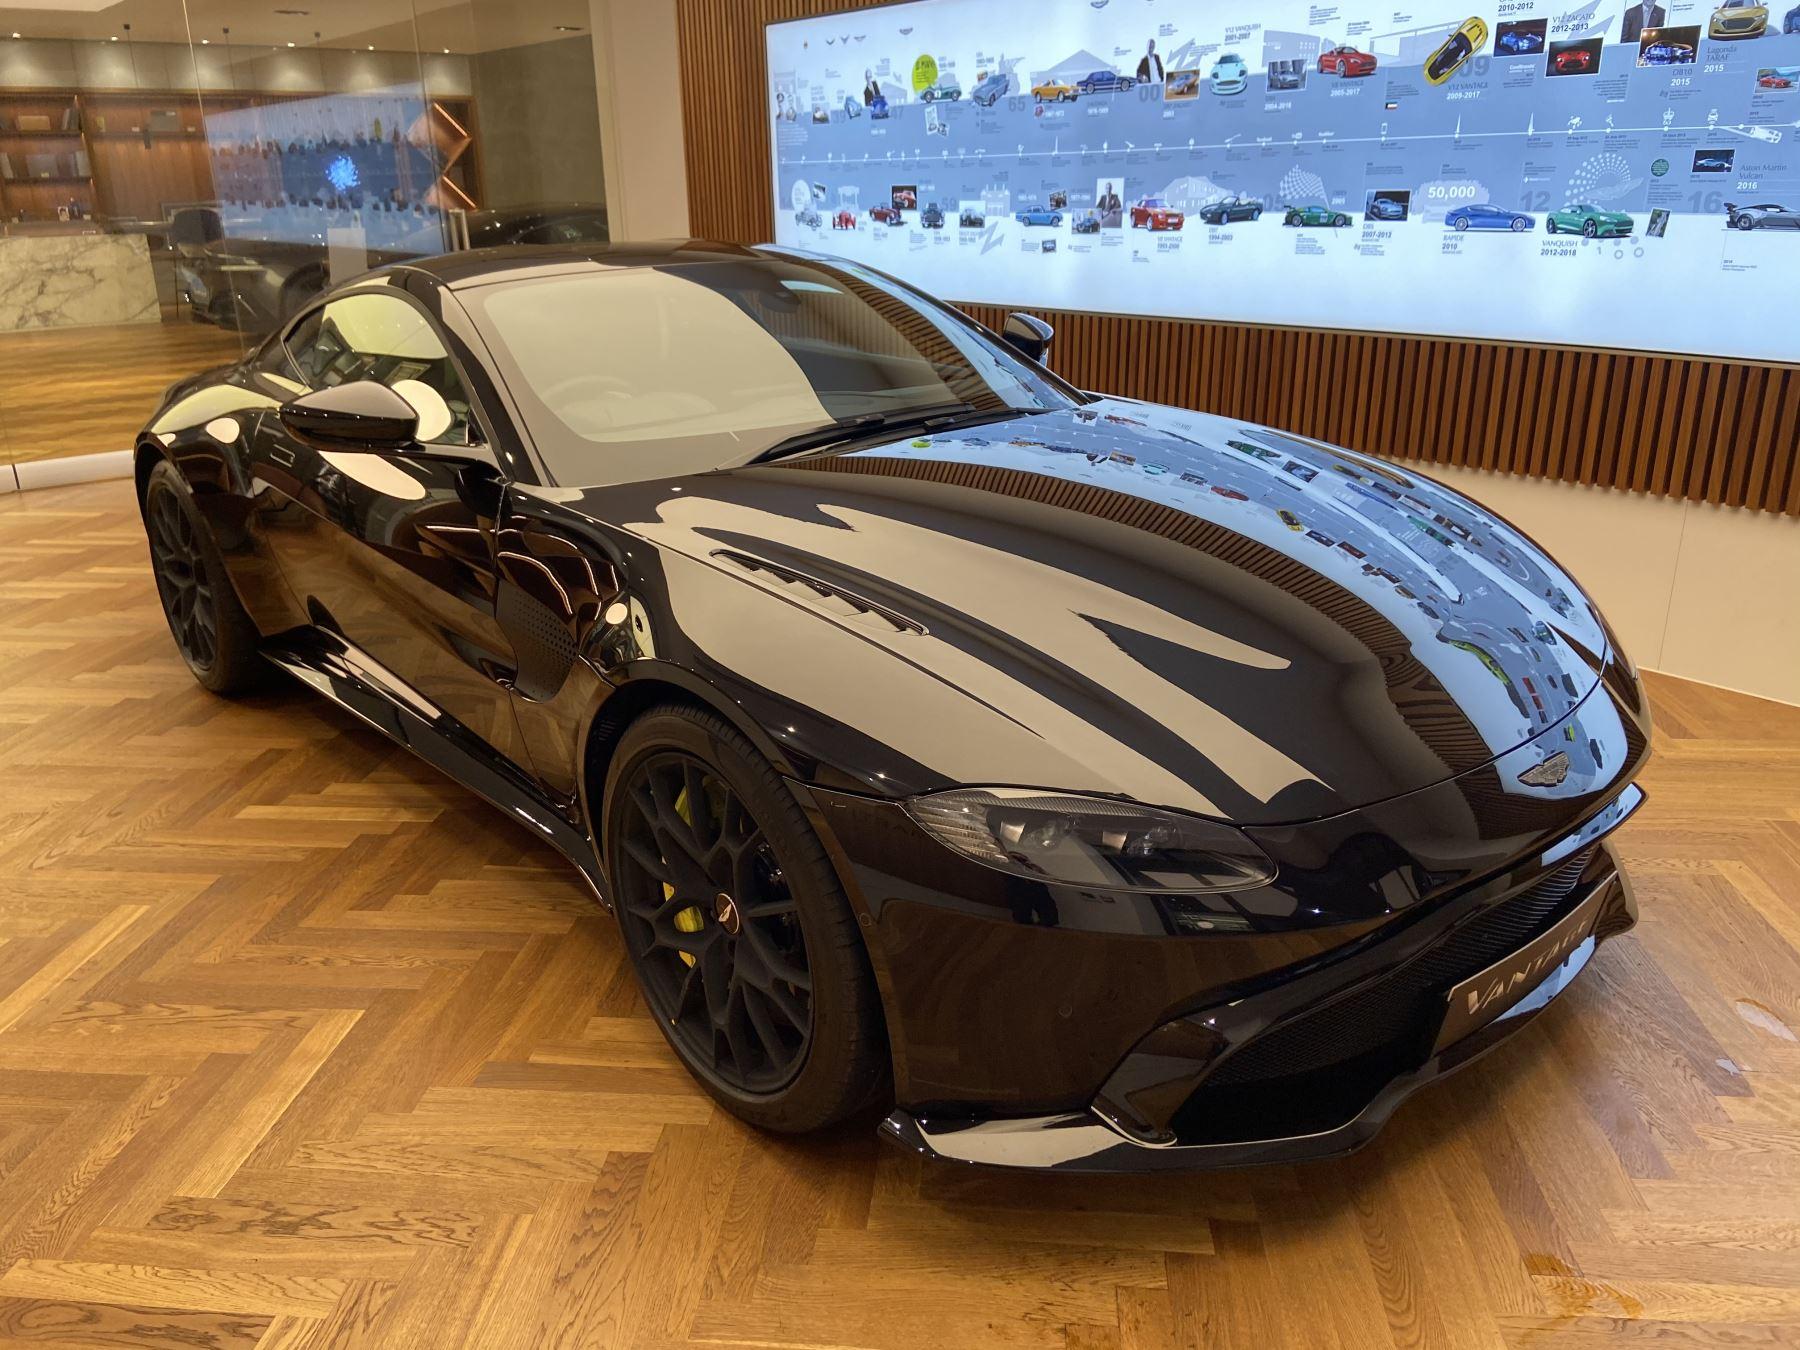 Aston Martin New Vantage AMR Hero Edition  image 2